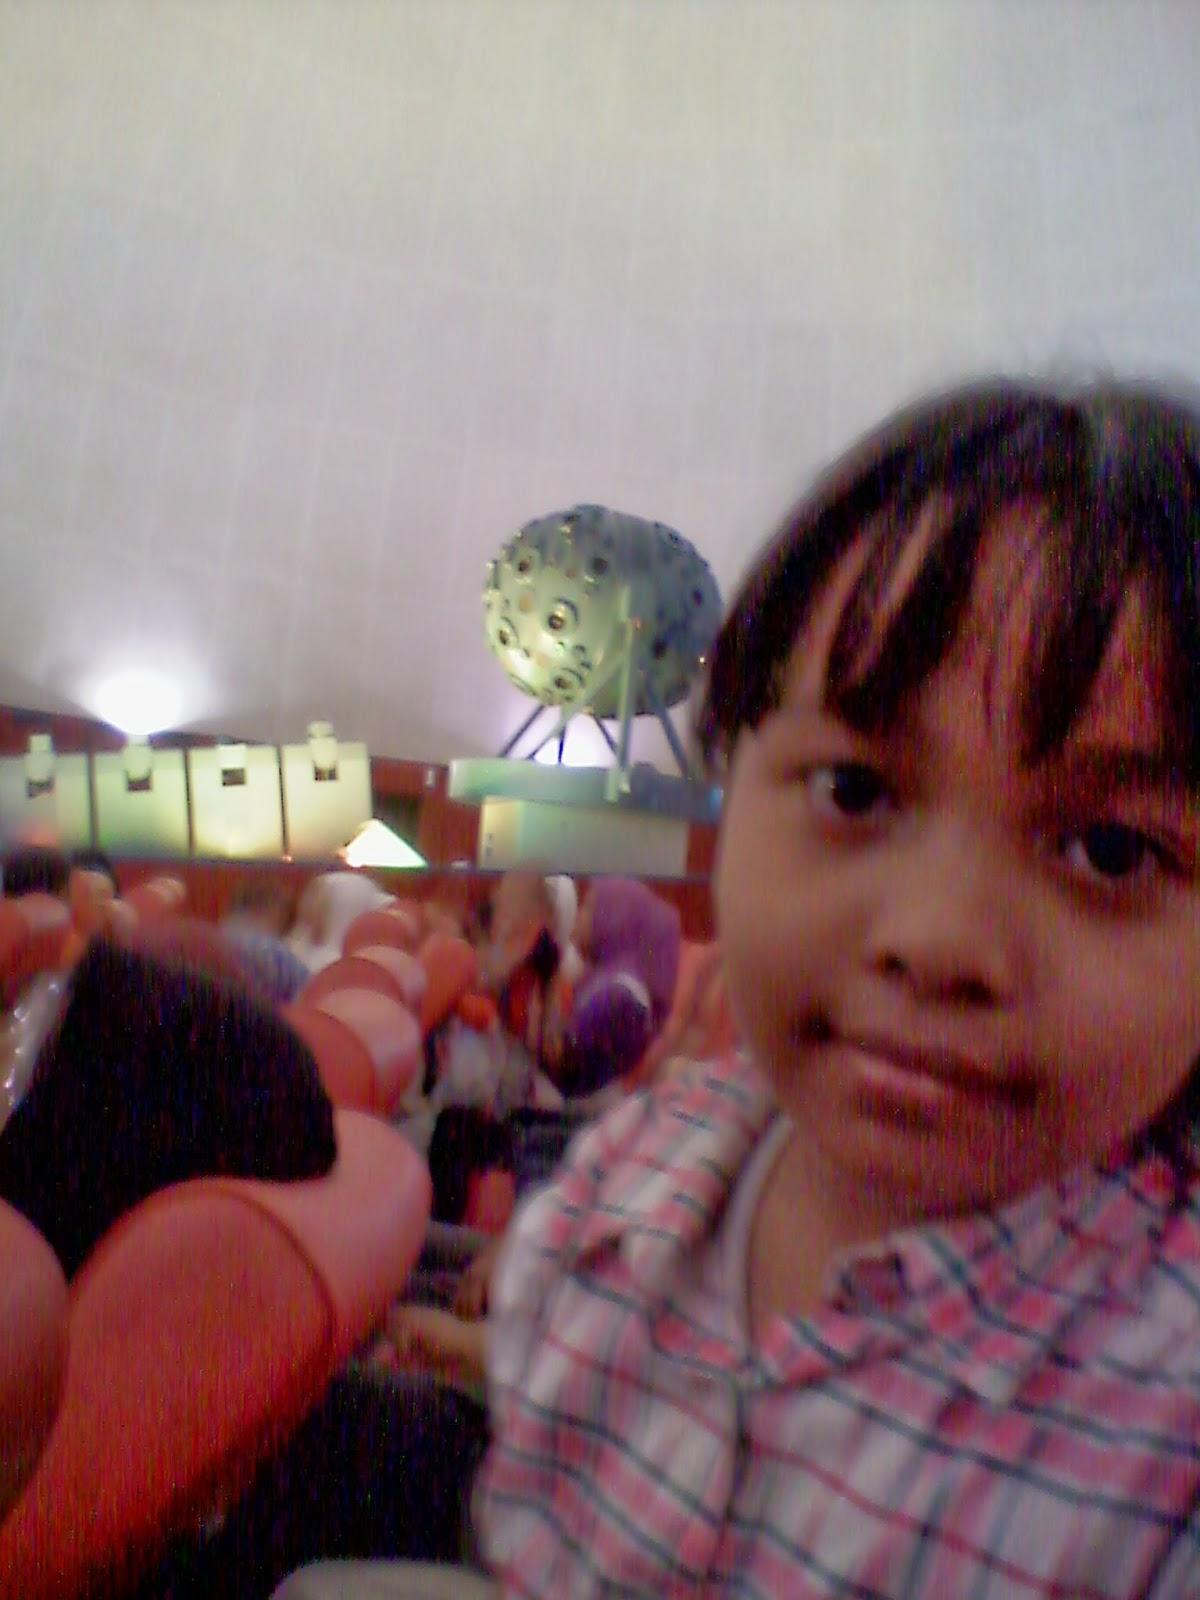 Jadwal Pertunjukan Planetarium Jakarta dan Harga Tiketnya